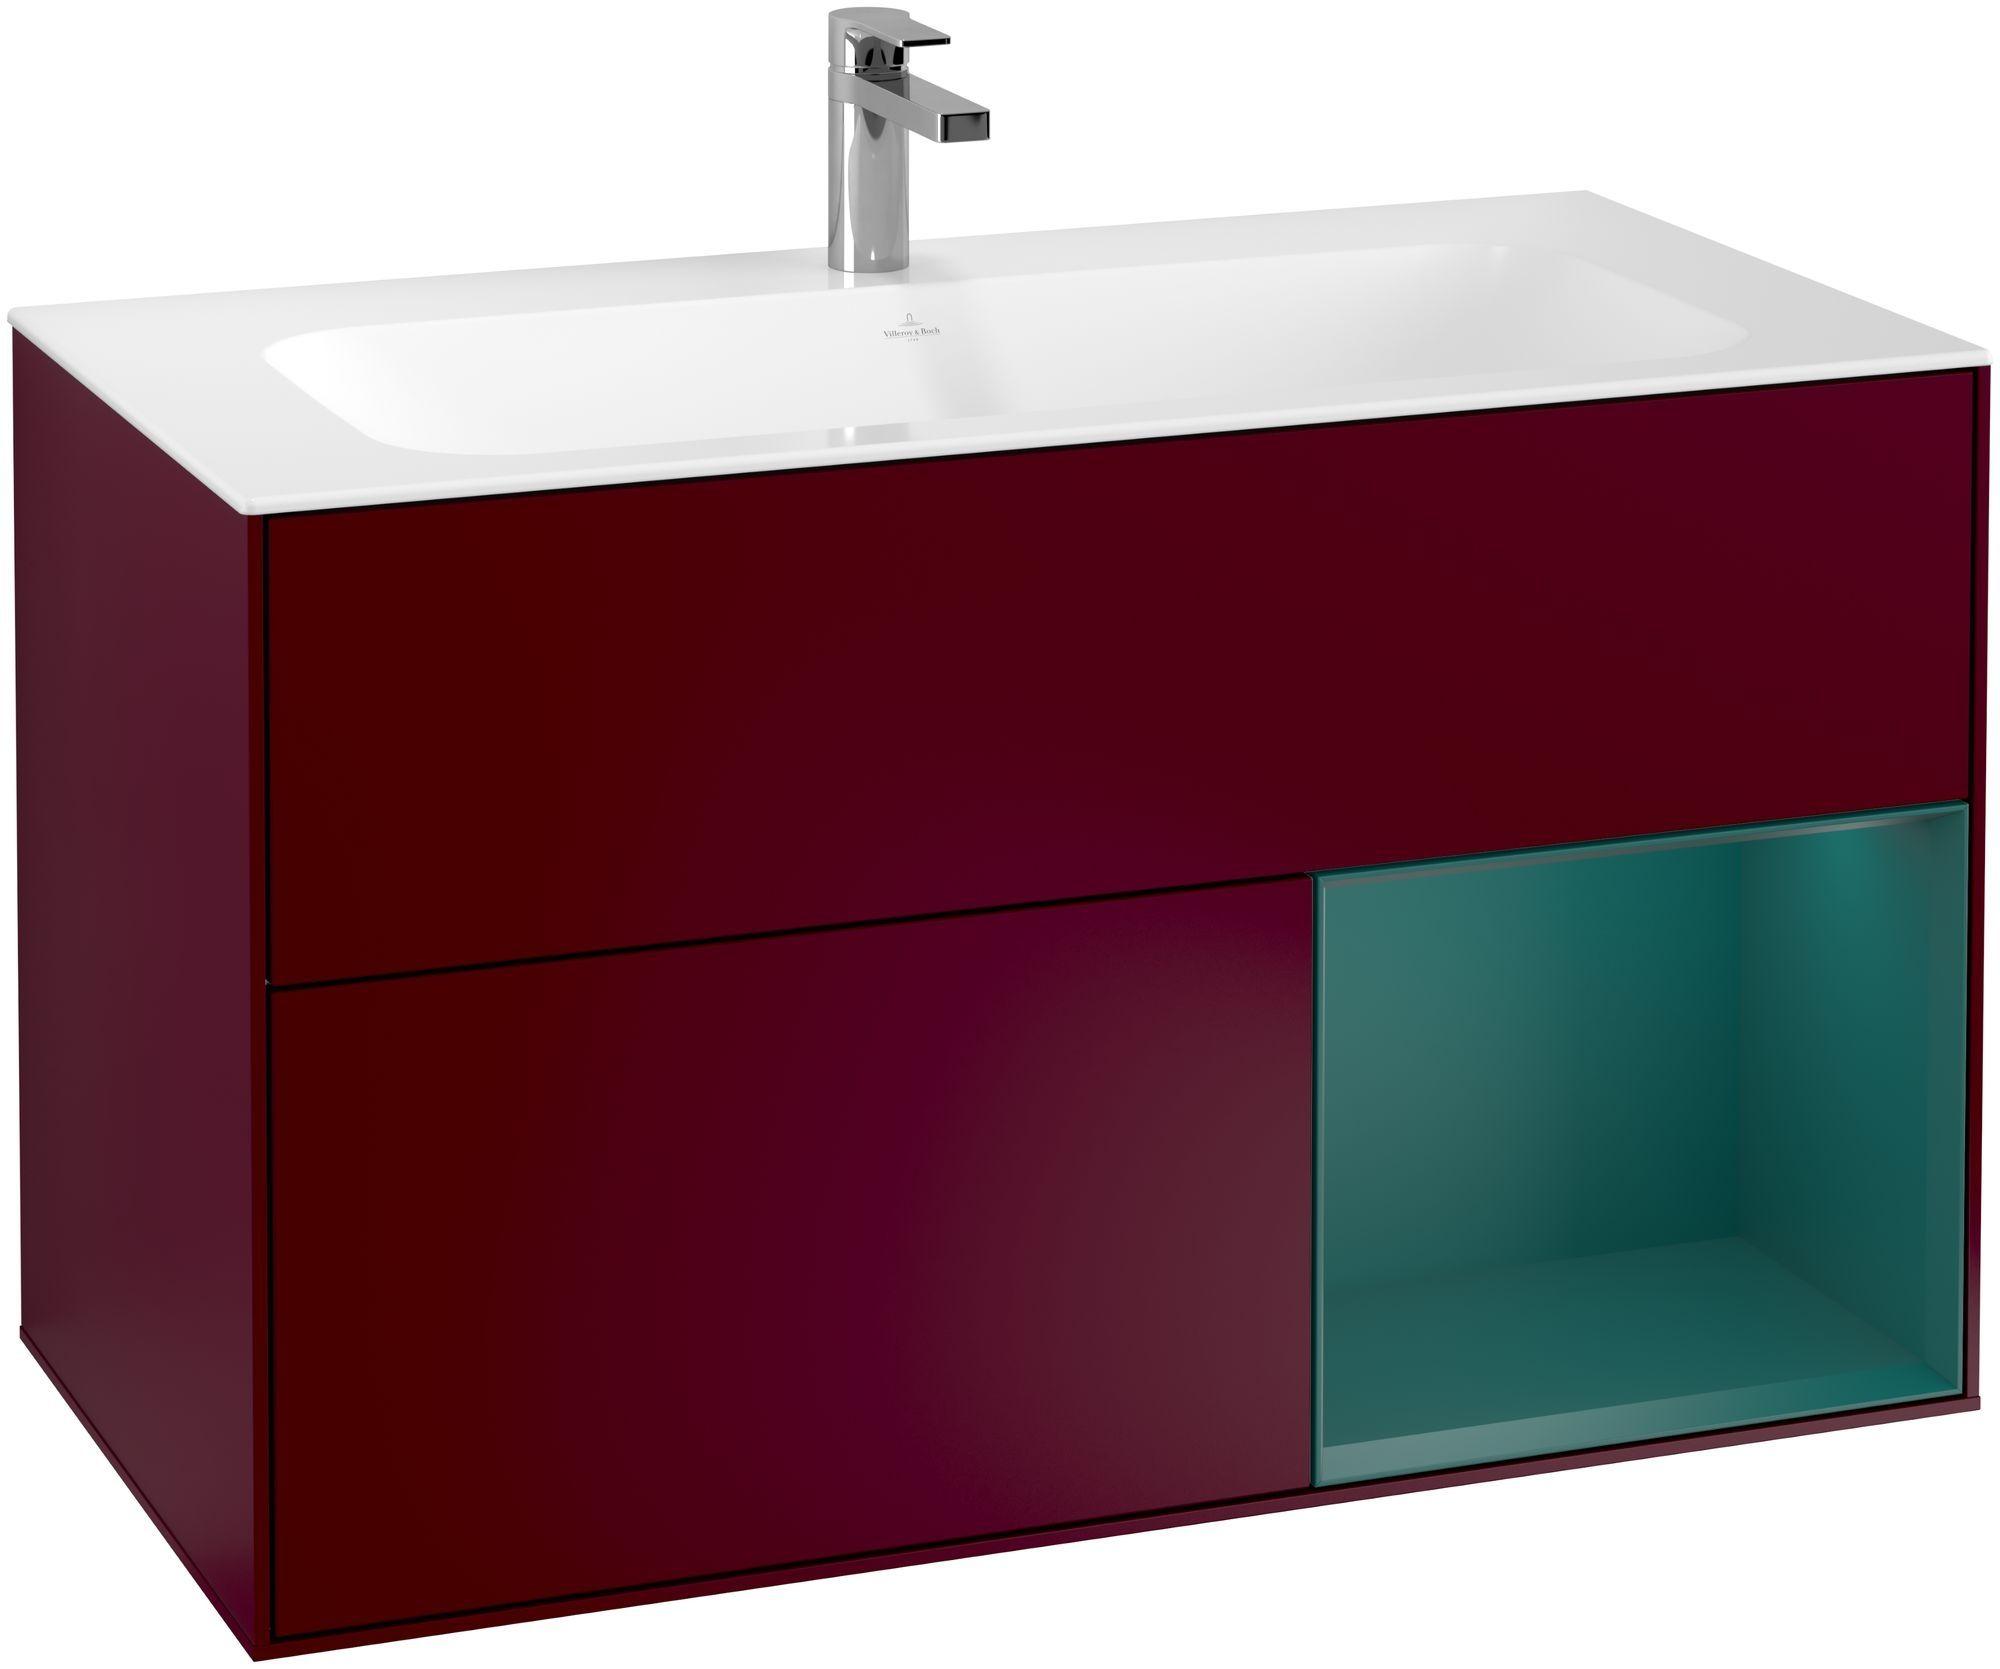 Villeroy & Boch Finion F04 Waschtischunterschrank mit Regalelement 2 Auszüge LED-Beleuchtung B:99,6xH:59,1xT:49,8cm Front, Korpus: Peony, Regal: Cedar F040GSHB